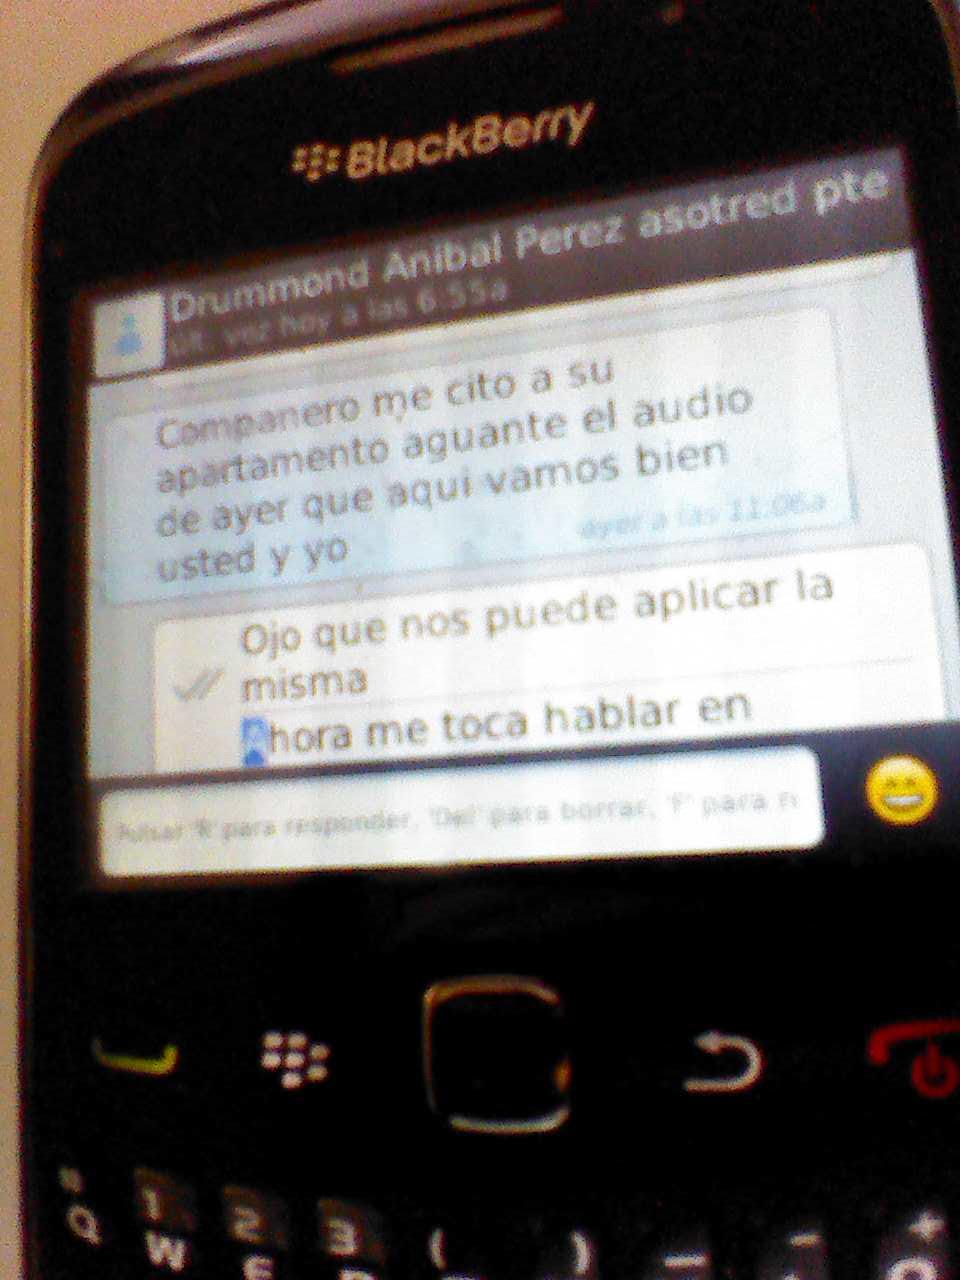 Chat entre Gabriel Padilla y Aníbal Pérez parte 3